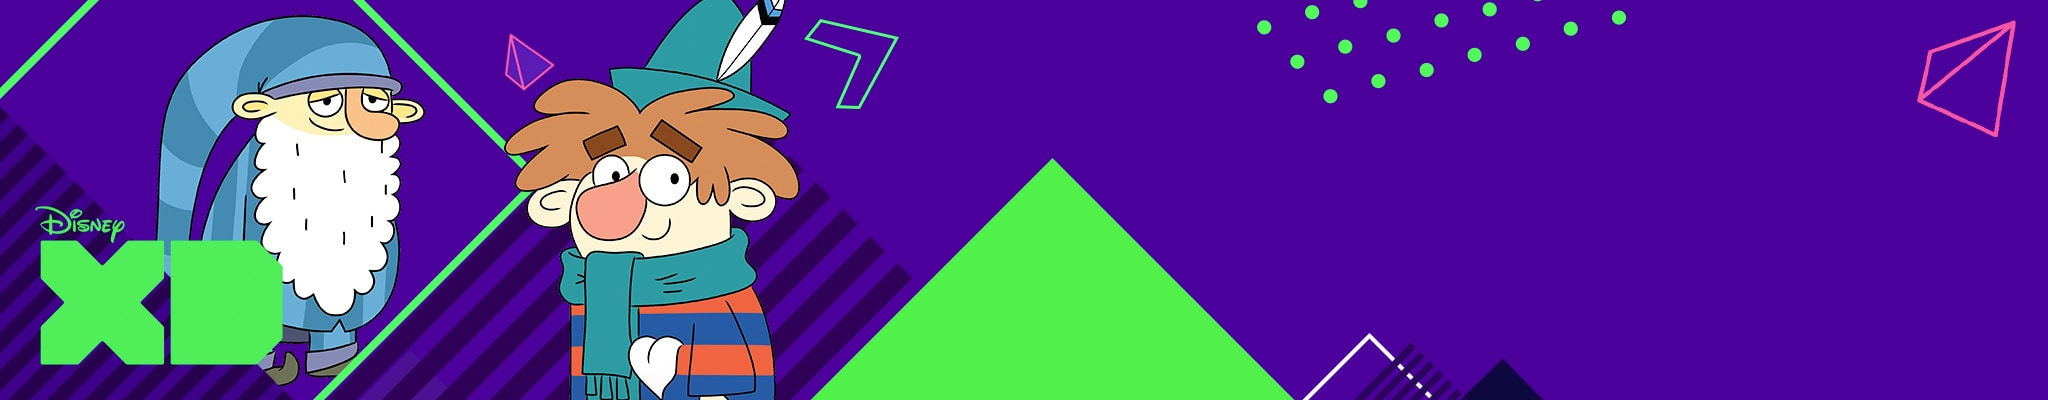 NL DXD - Crosslink Hero banner - 7D Showpage